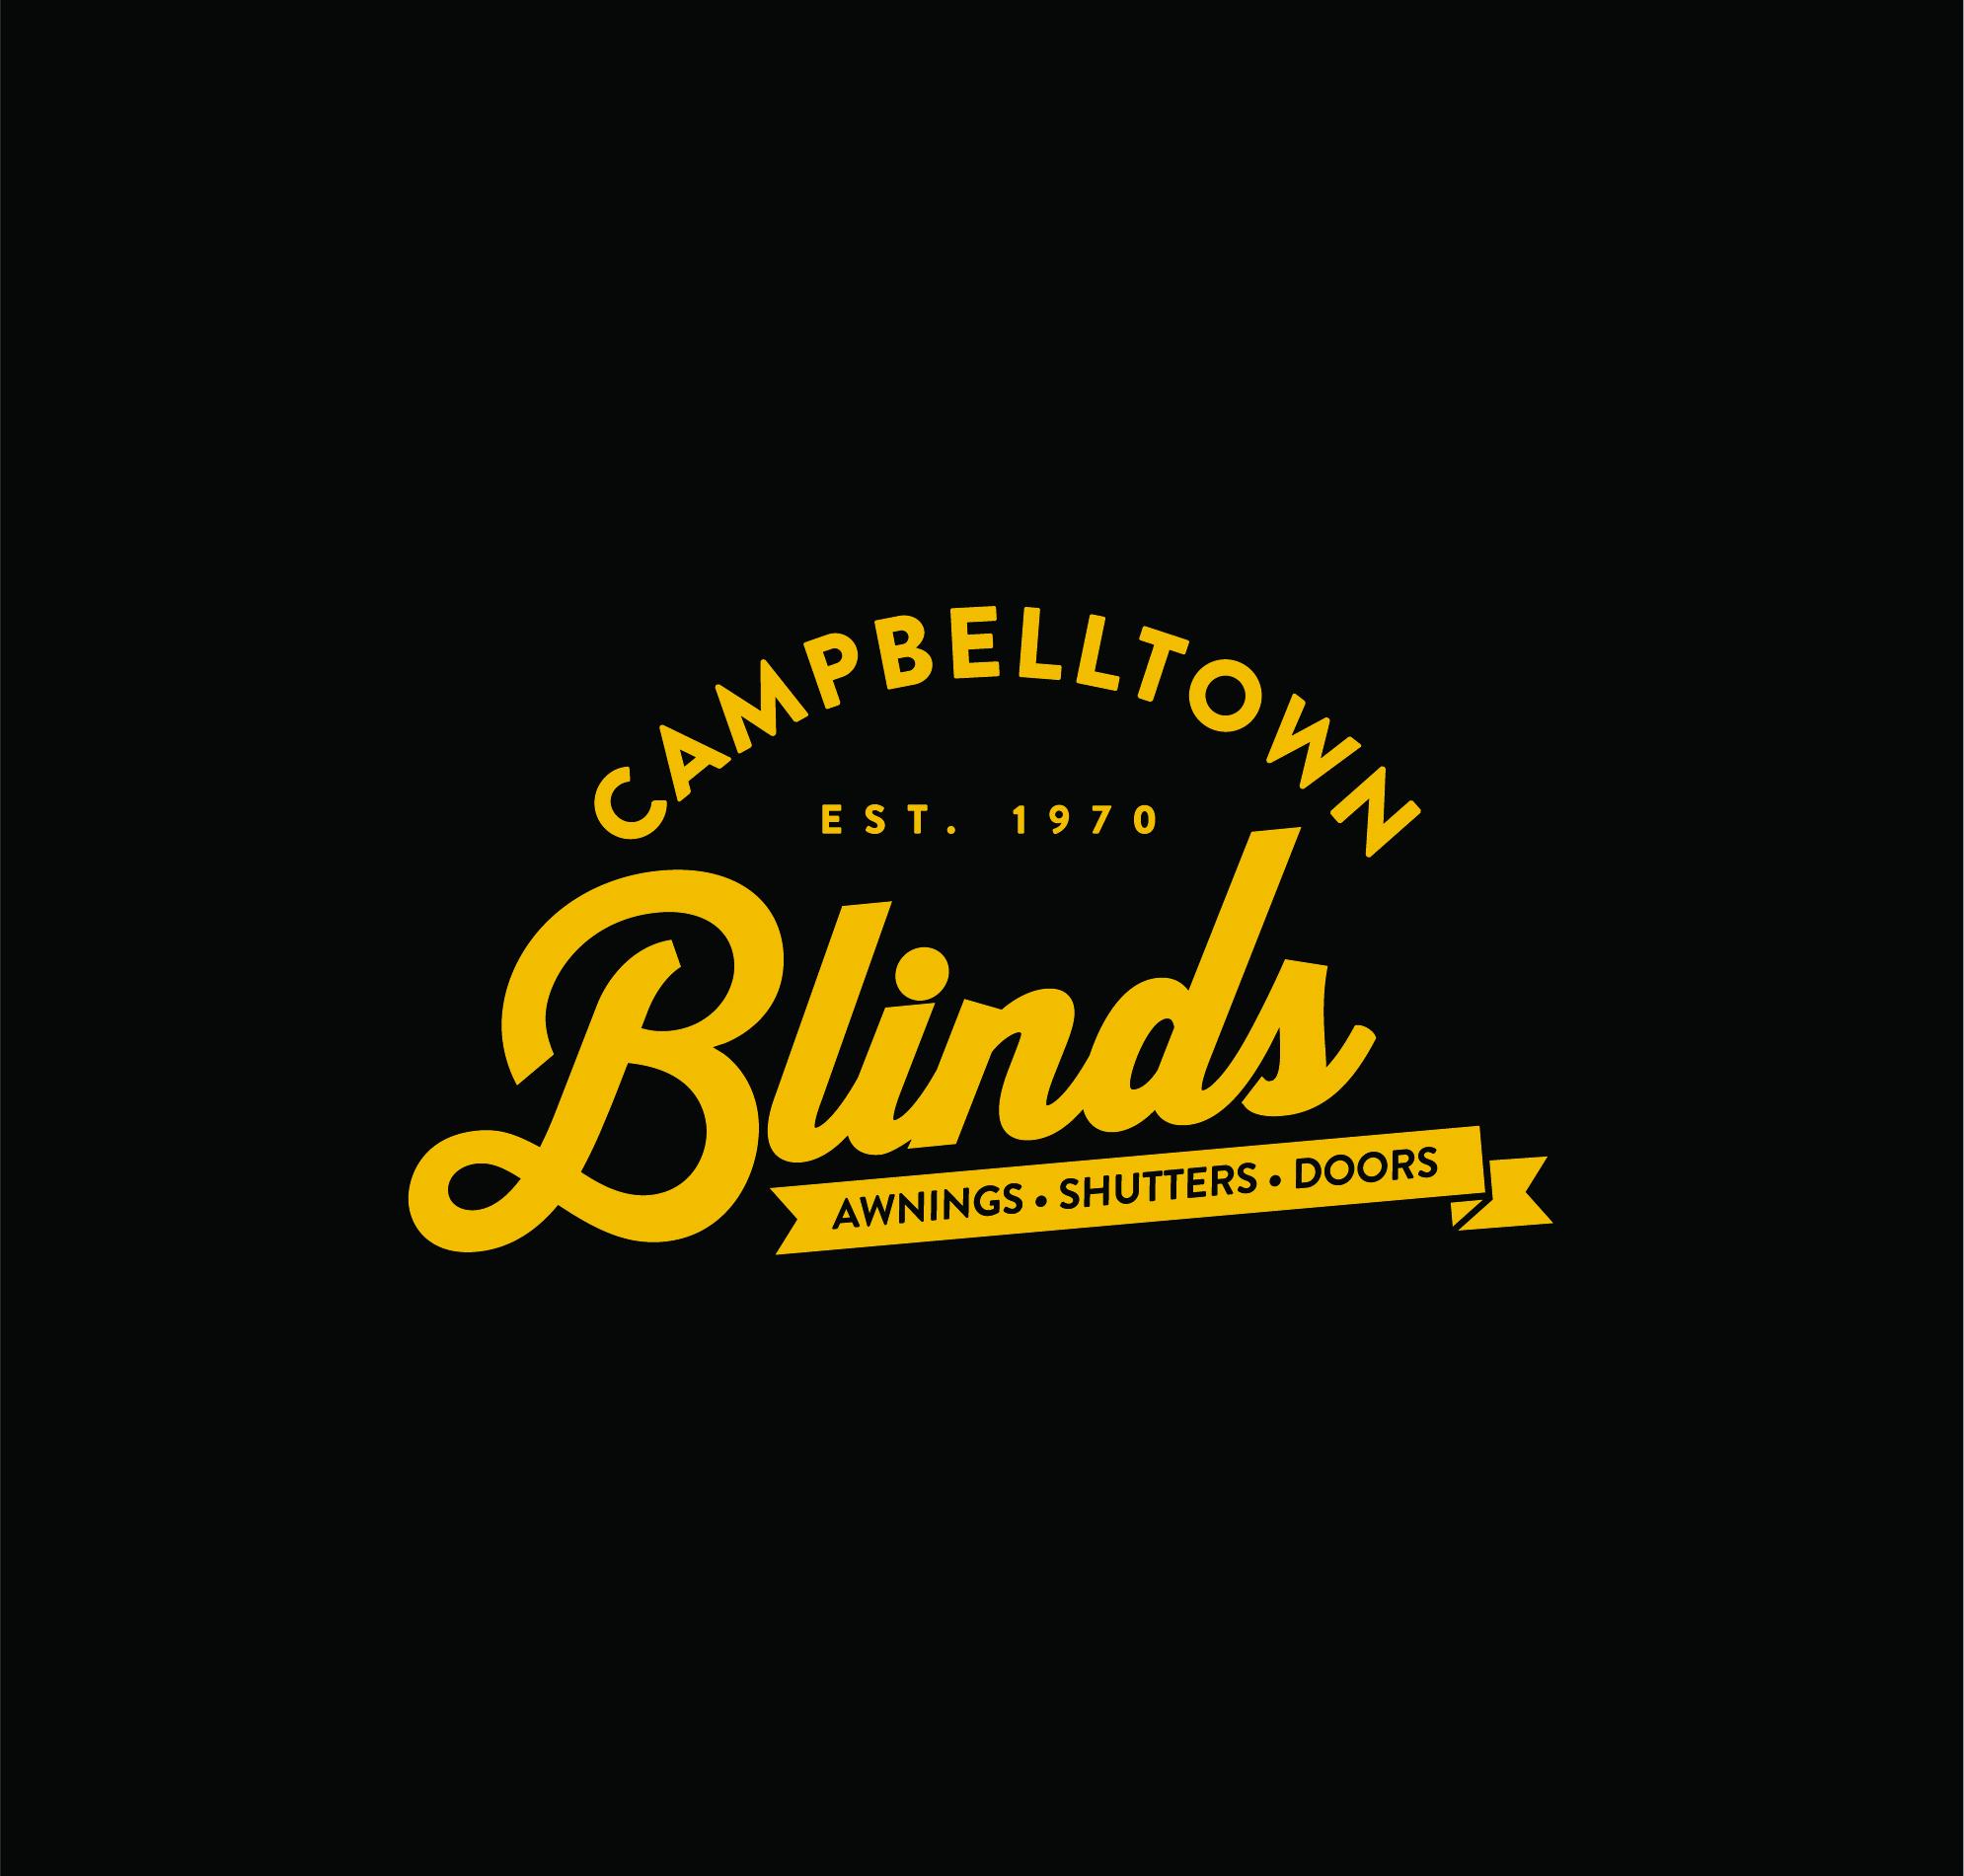 Campbelltown Blinds & Security Doors